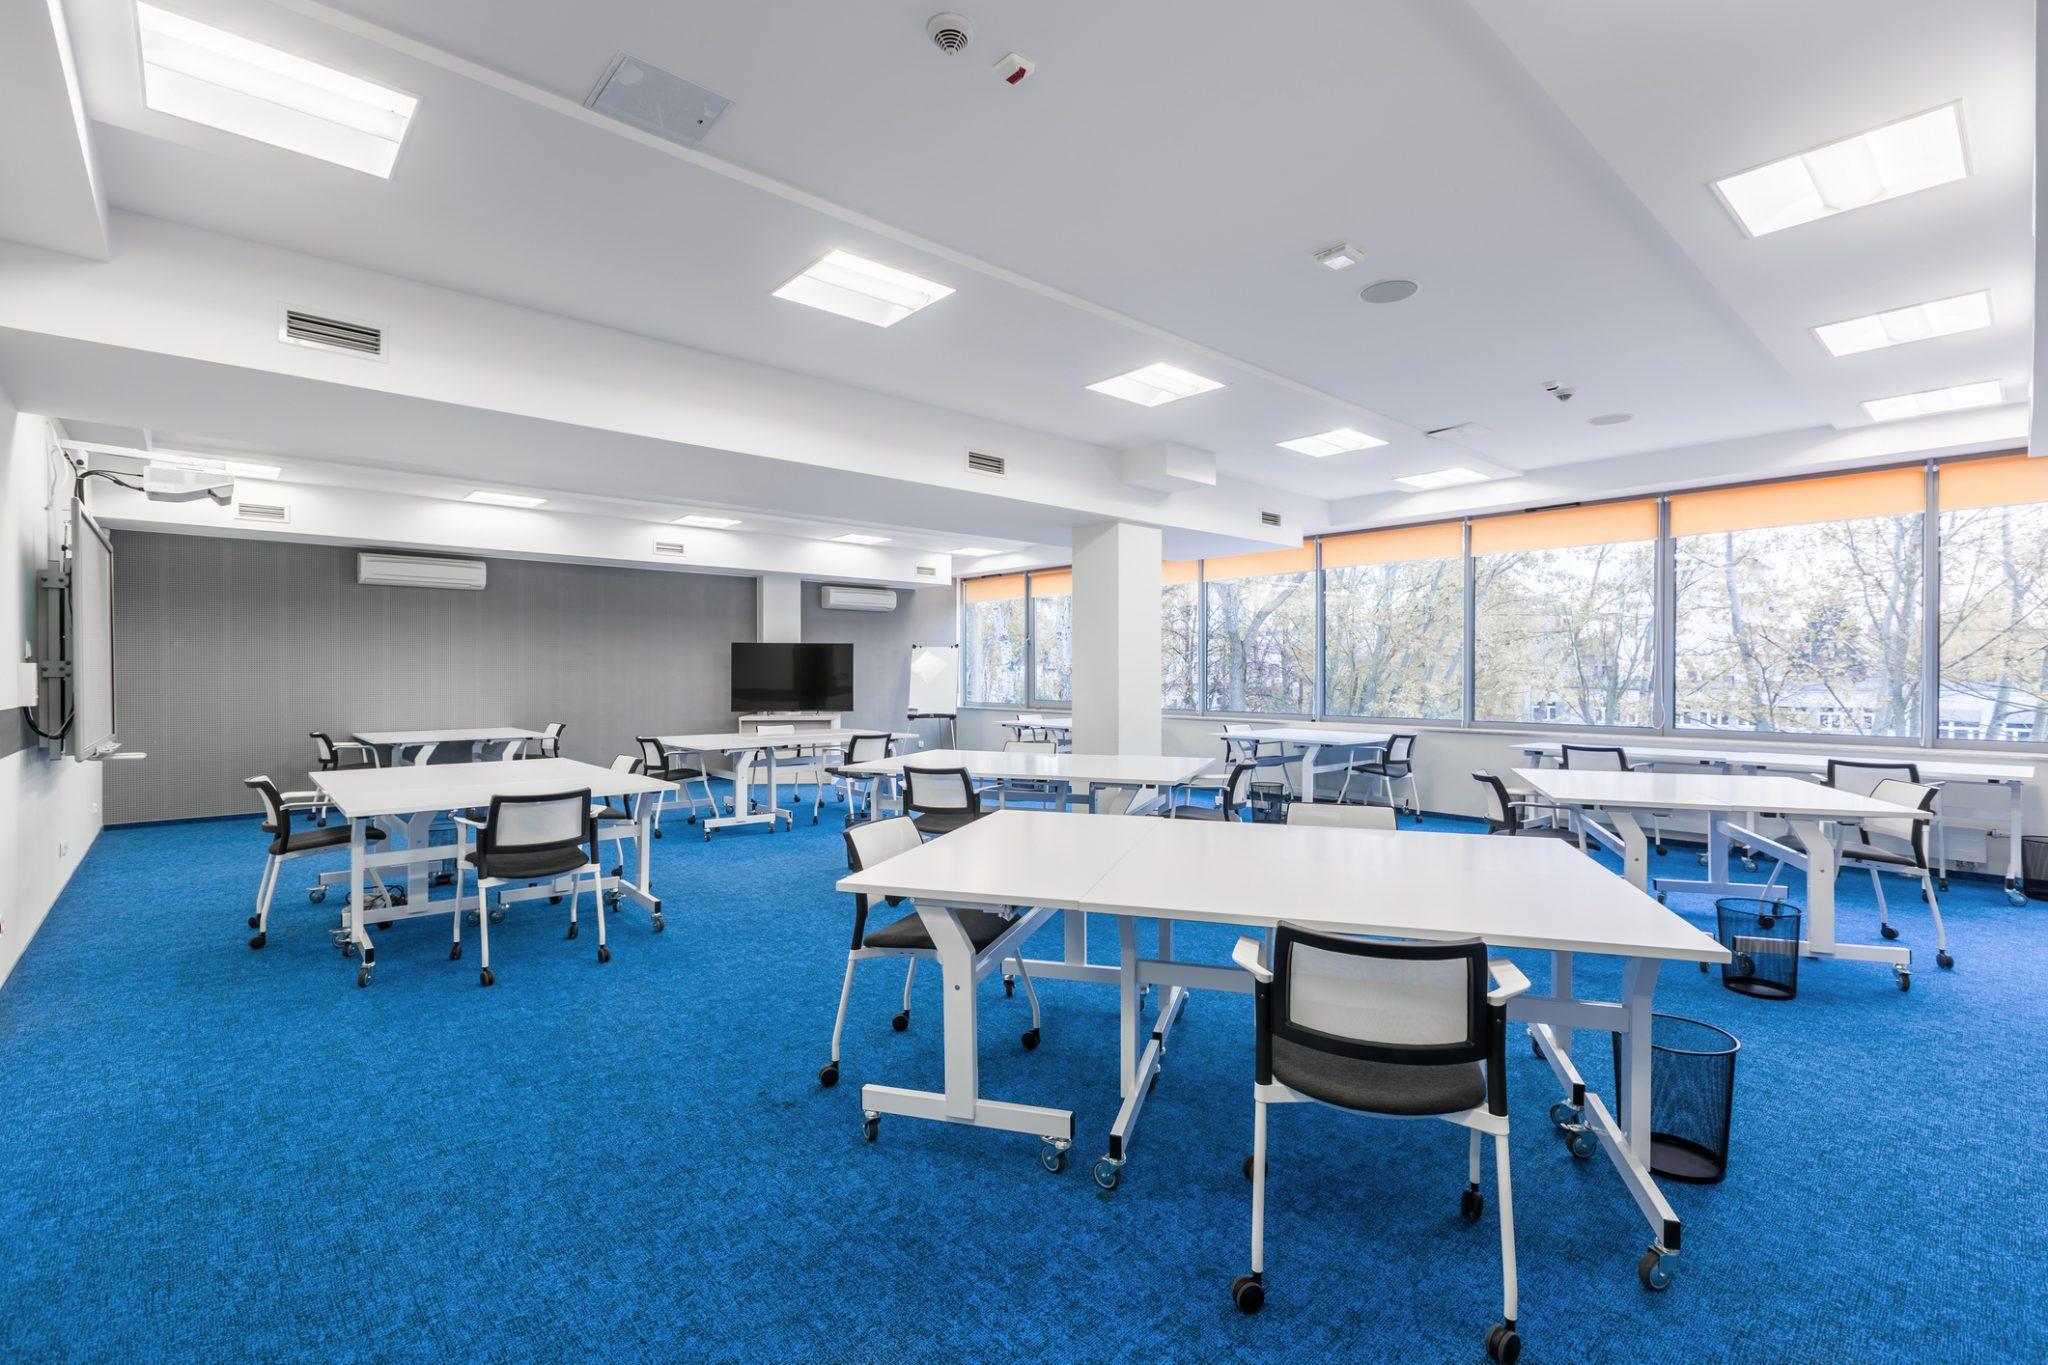 Modular Classroom Considerations